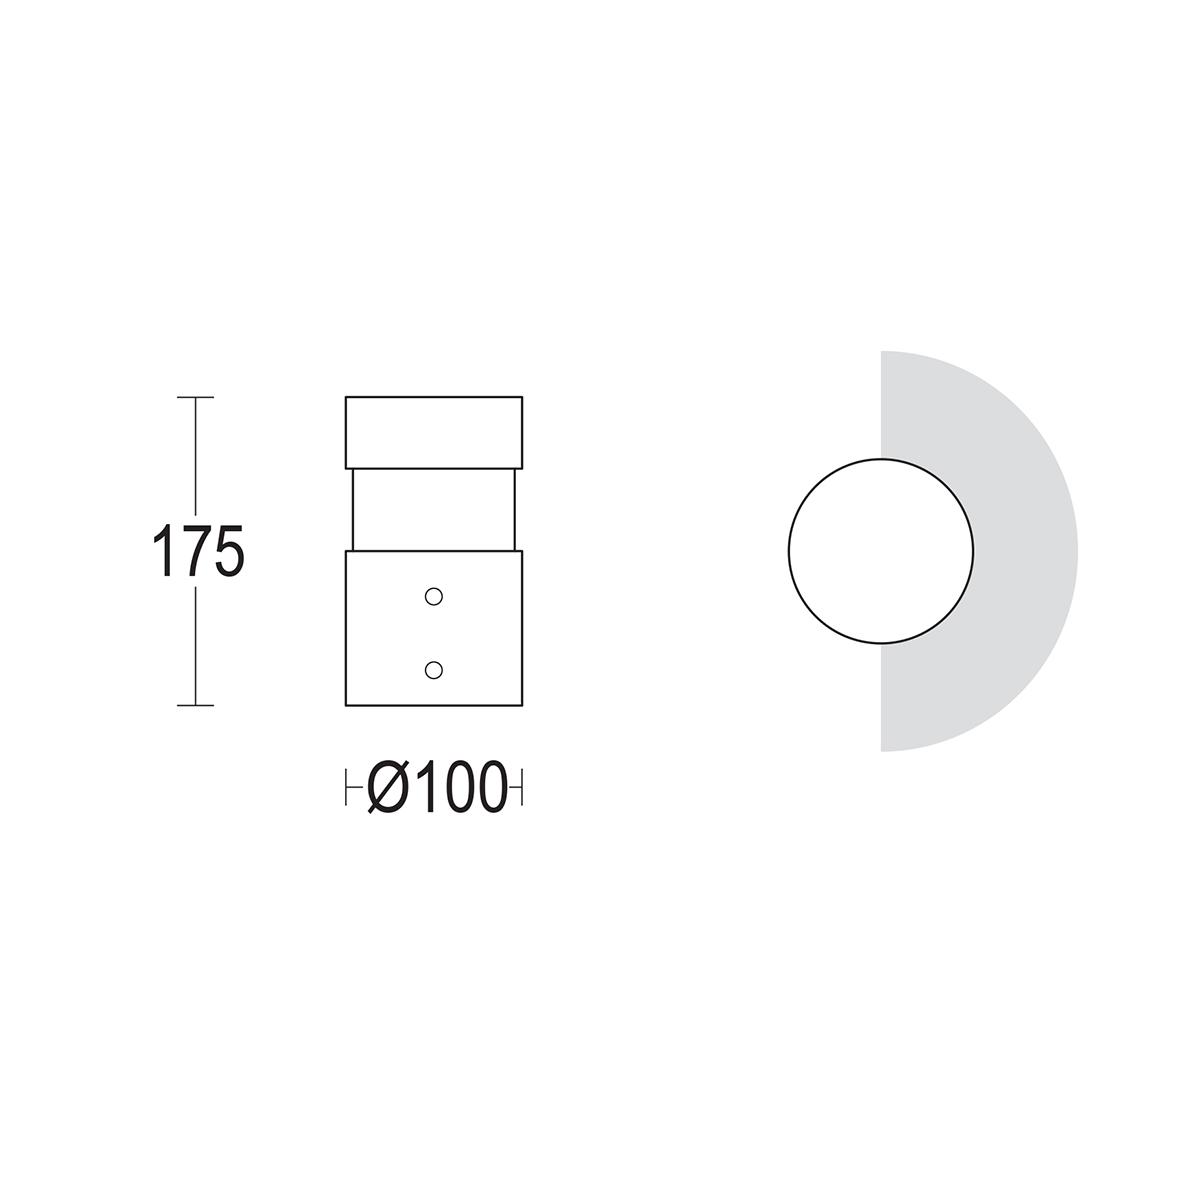 чертеж Tondo 175 Ghidini уличный светильник GH1456.LVXT300EN